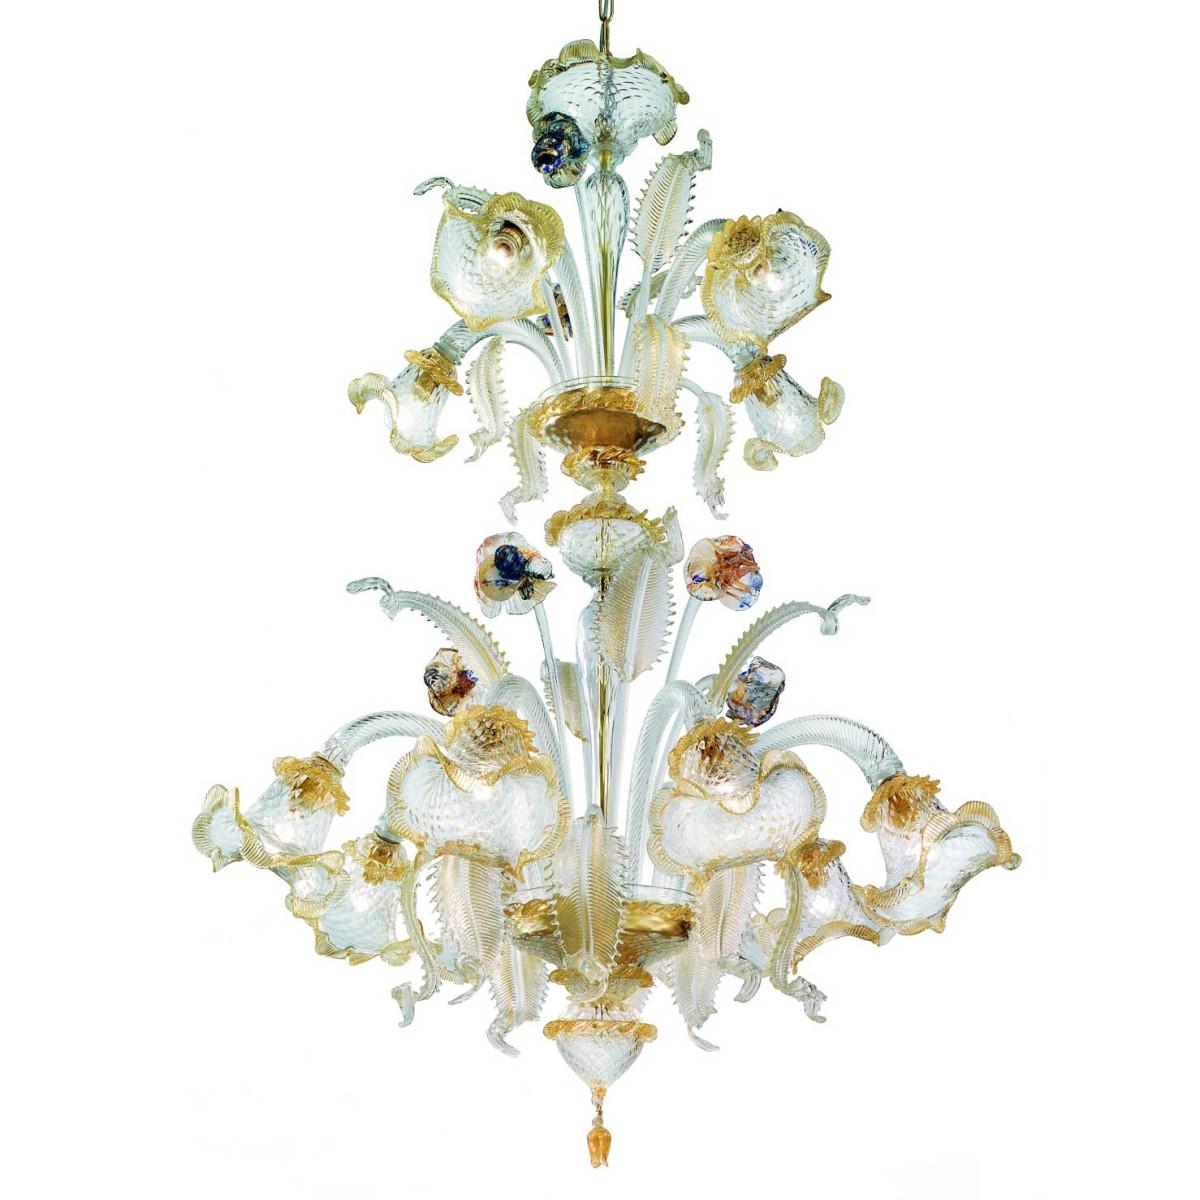 Canal Grande 2 Tier 8 +4 flammig Murano-Kronleuchter transparent Gold polychromen